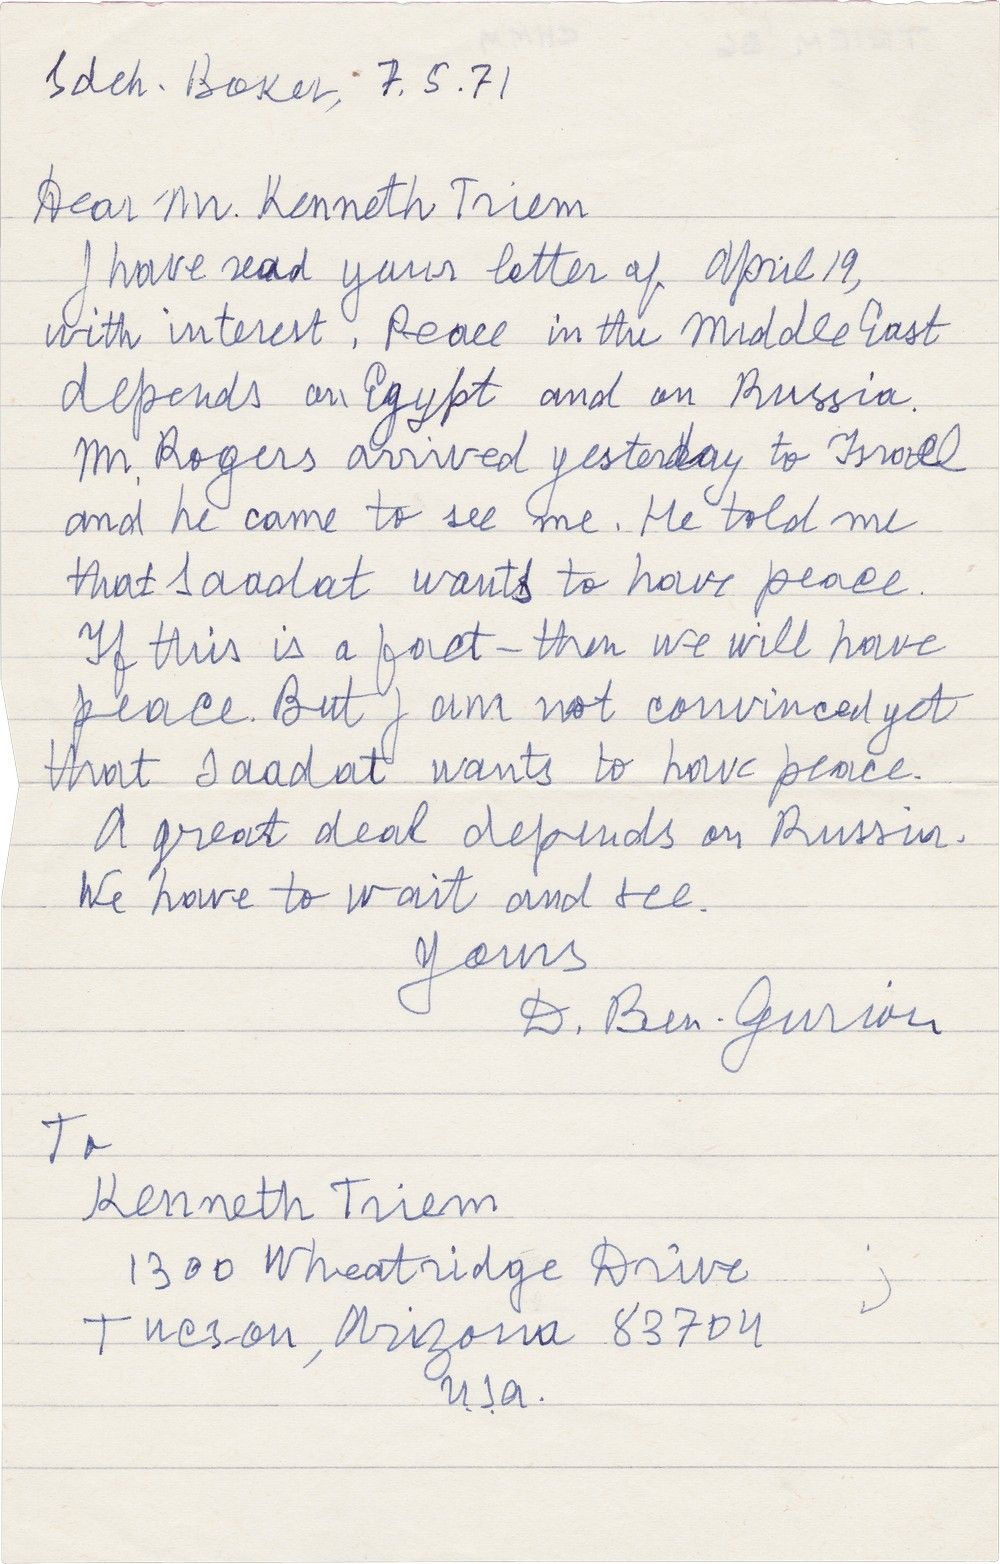 David Ben Gurion on Anwar Sadat's Wanting Peace in 1971: He Isn't Convinced